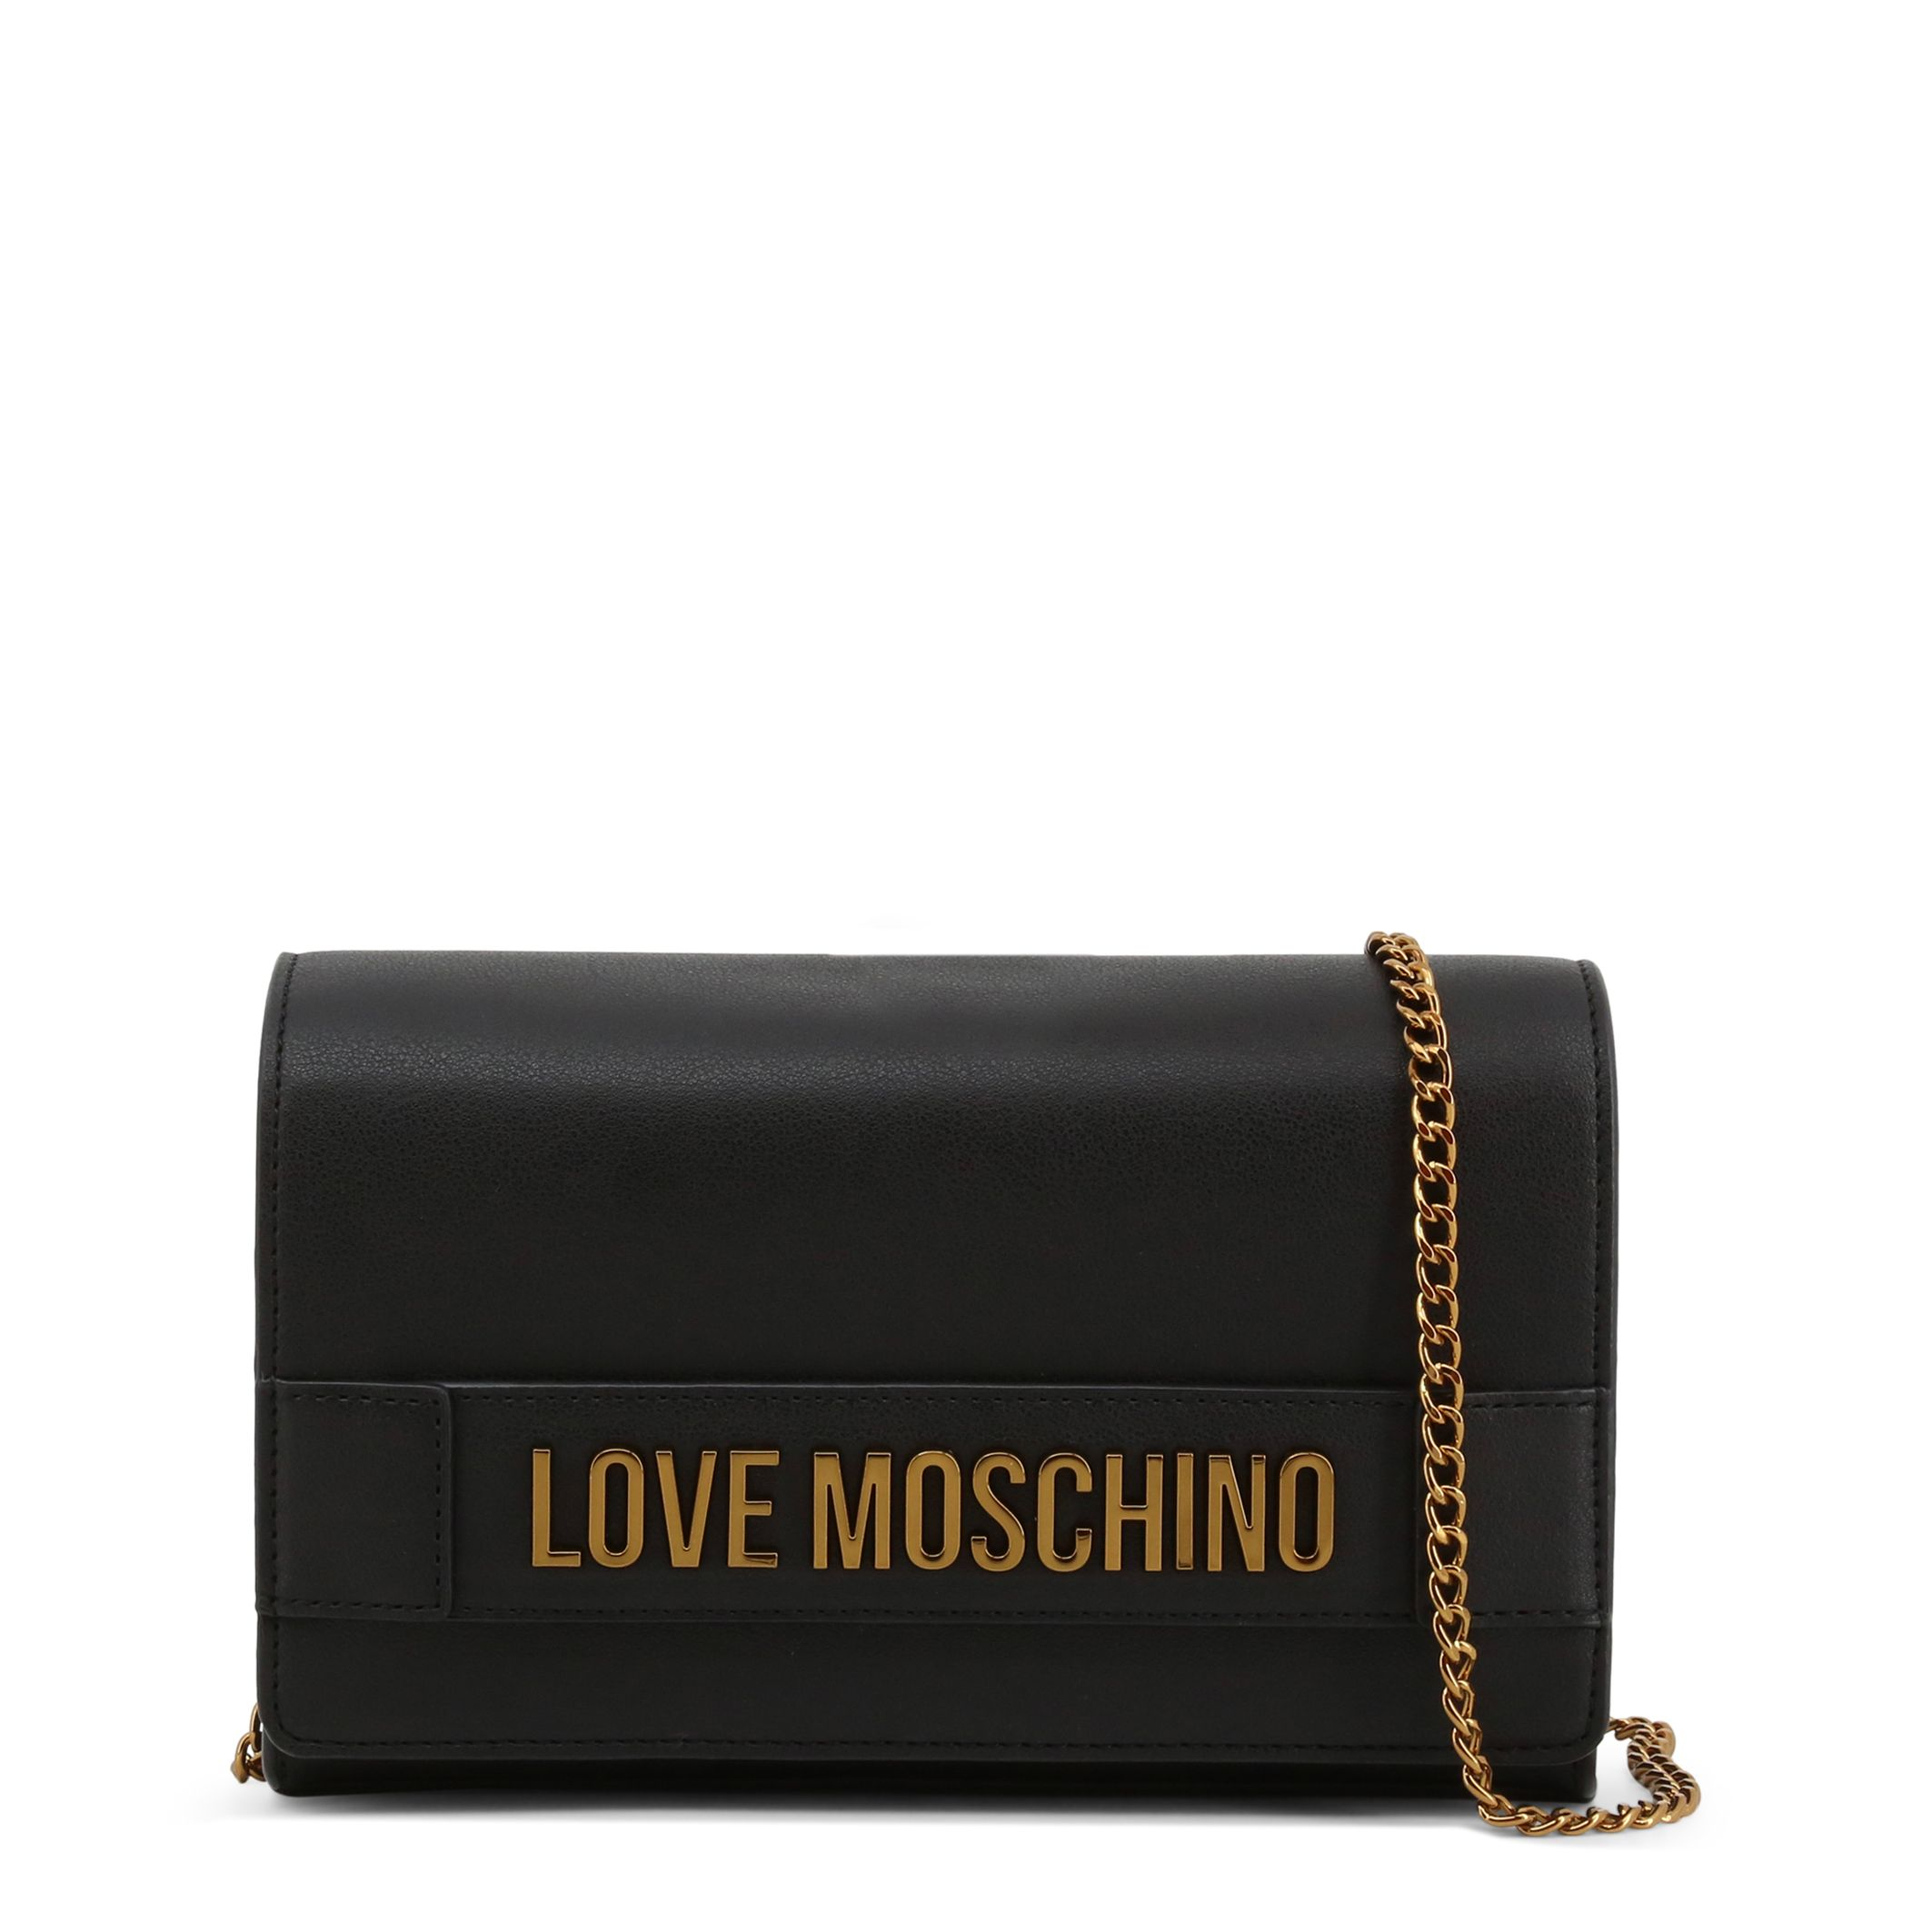 Love Moschino – JC4103PP1BLK